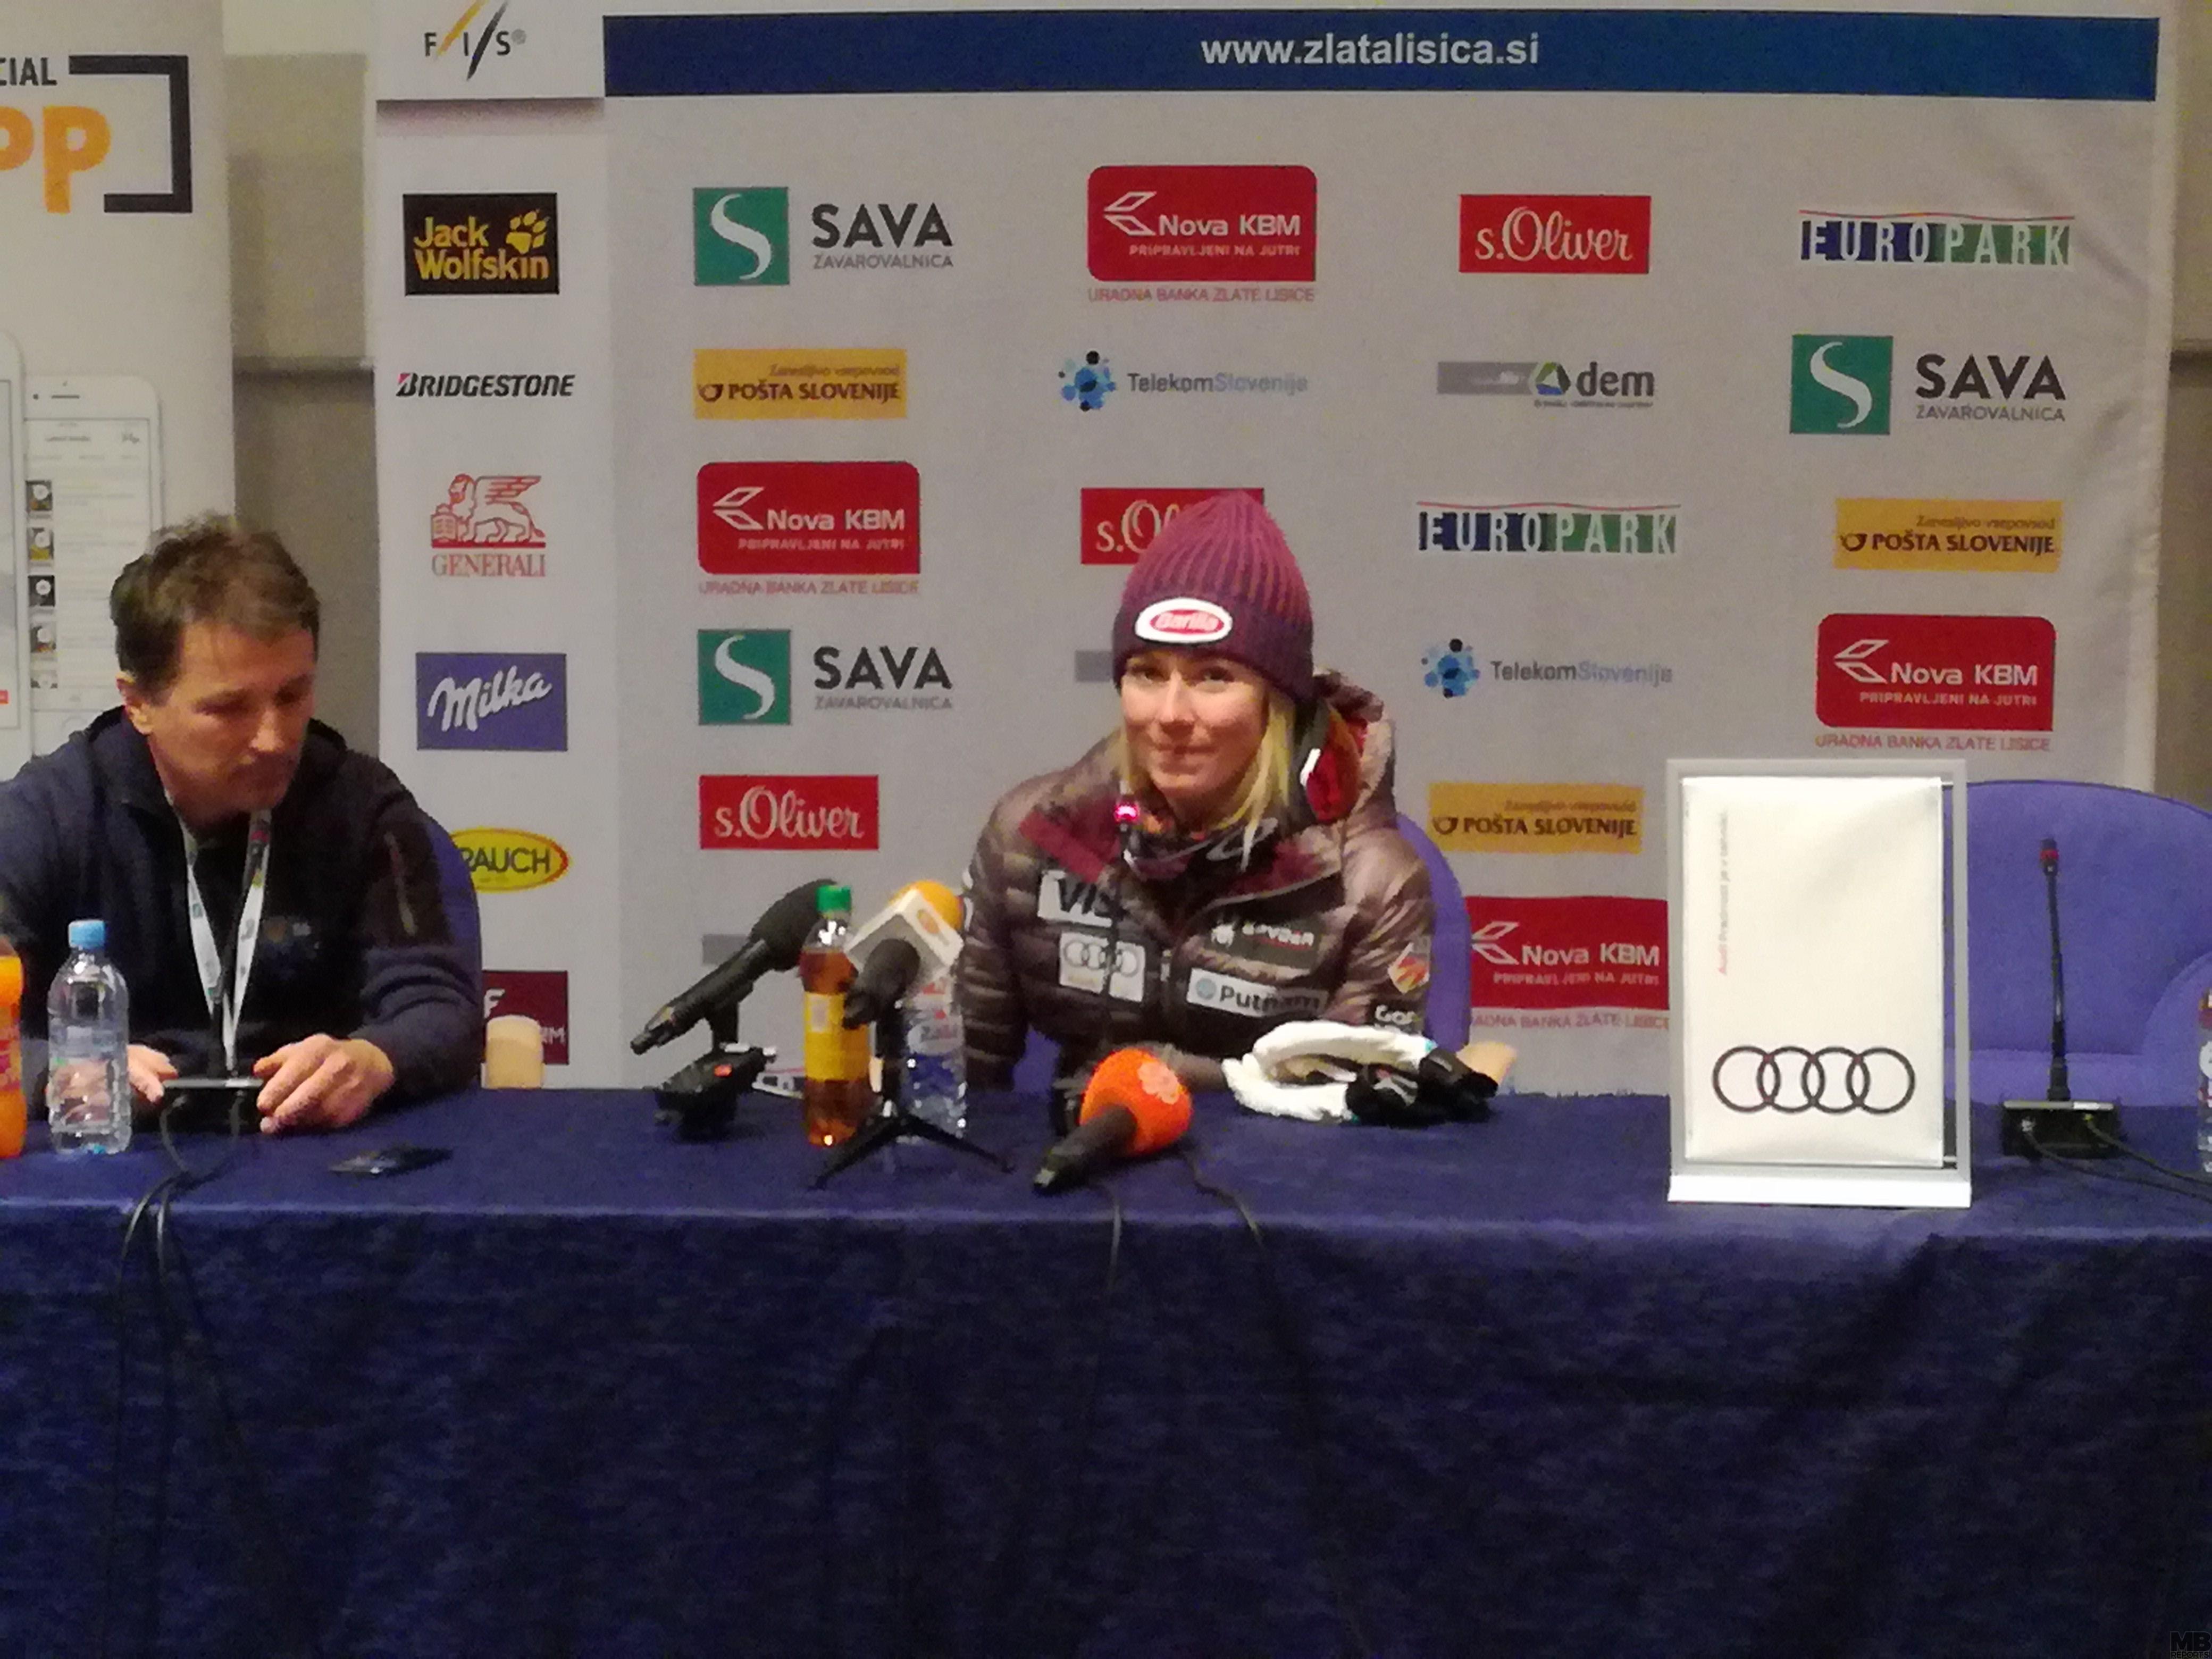 Mickaela Shiffrin na novinarski konferenci po 53. Zlati lisici.